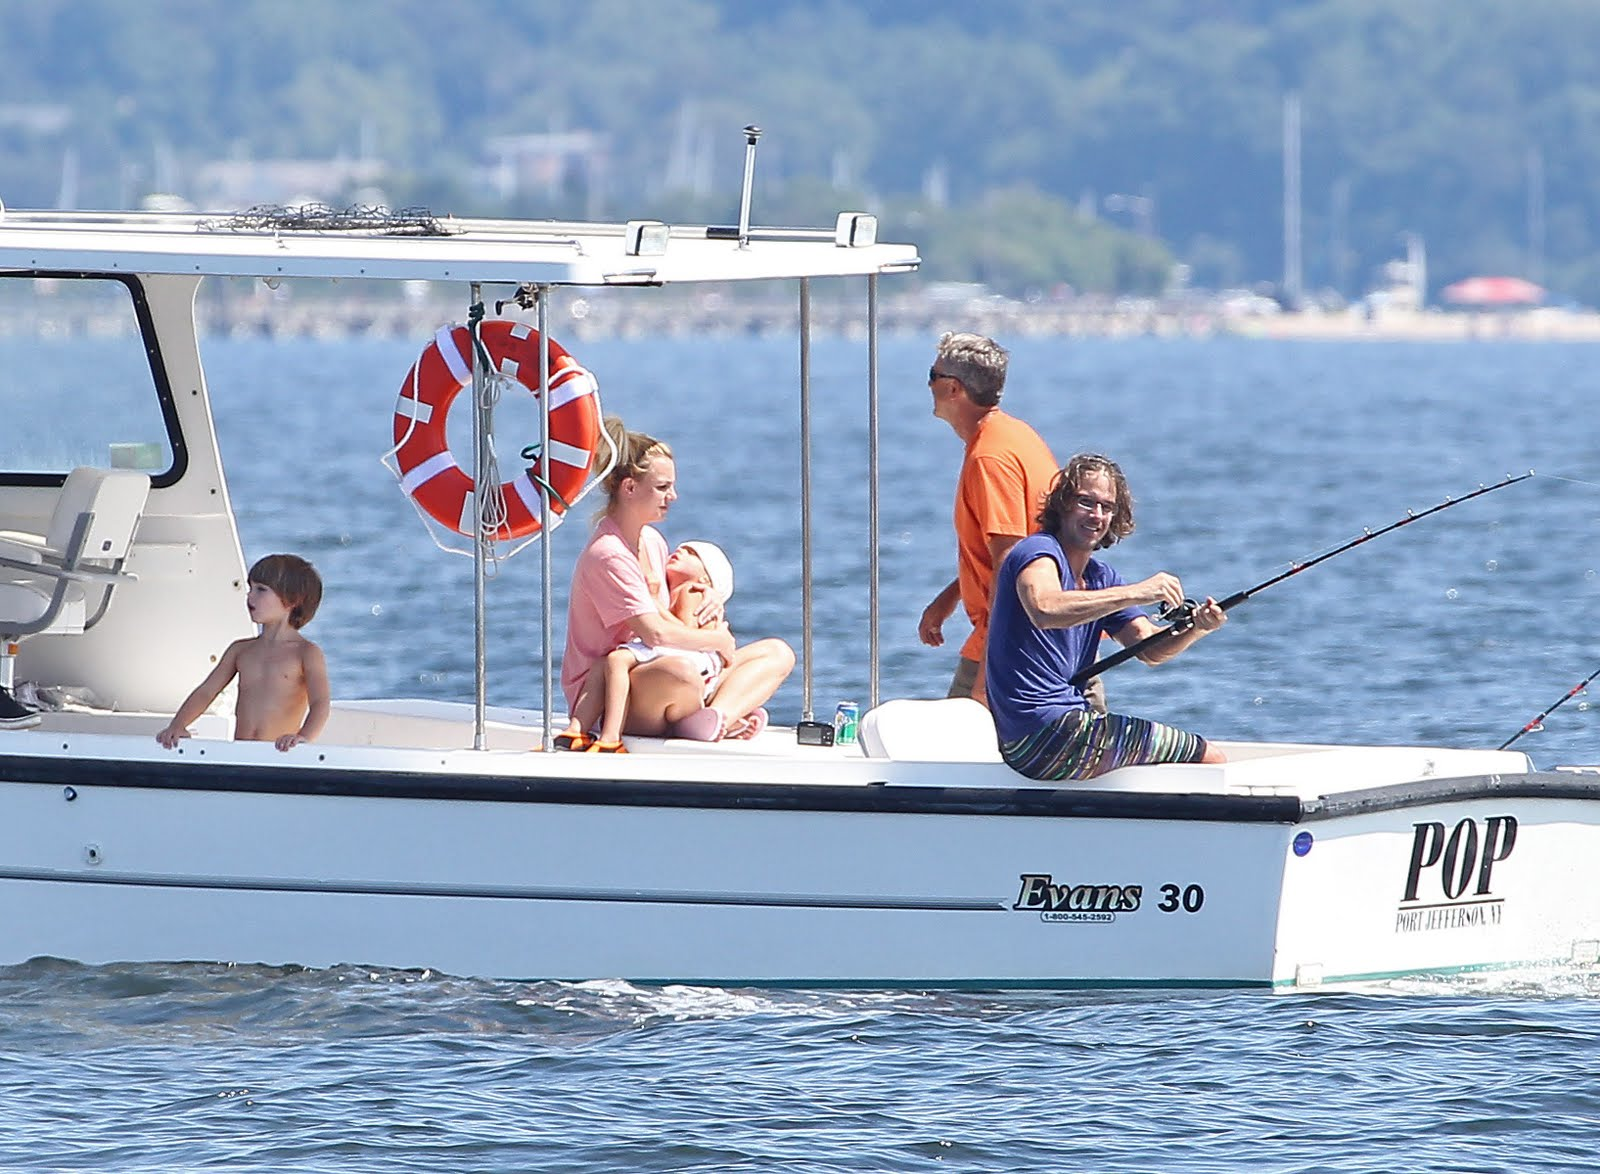 http://4.bp.blogspot.com/-TsDpC-ZOMz8/Tjv4BpJxPbI/AAAAAAAAC5I/0xeIrNP8Kjc/s1600/family-boat-day-august-4+%252812%2529.jpg